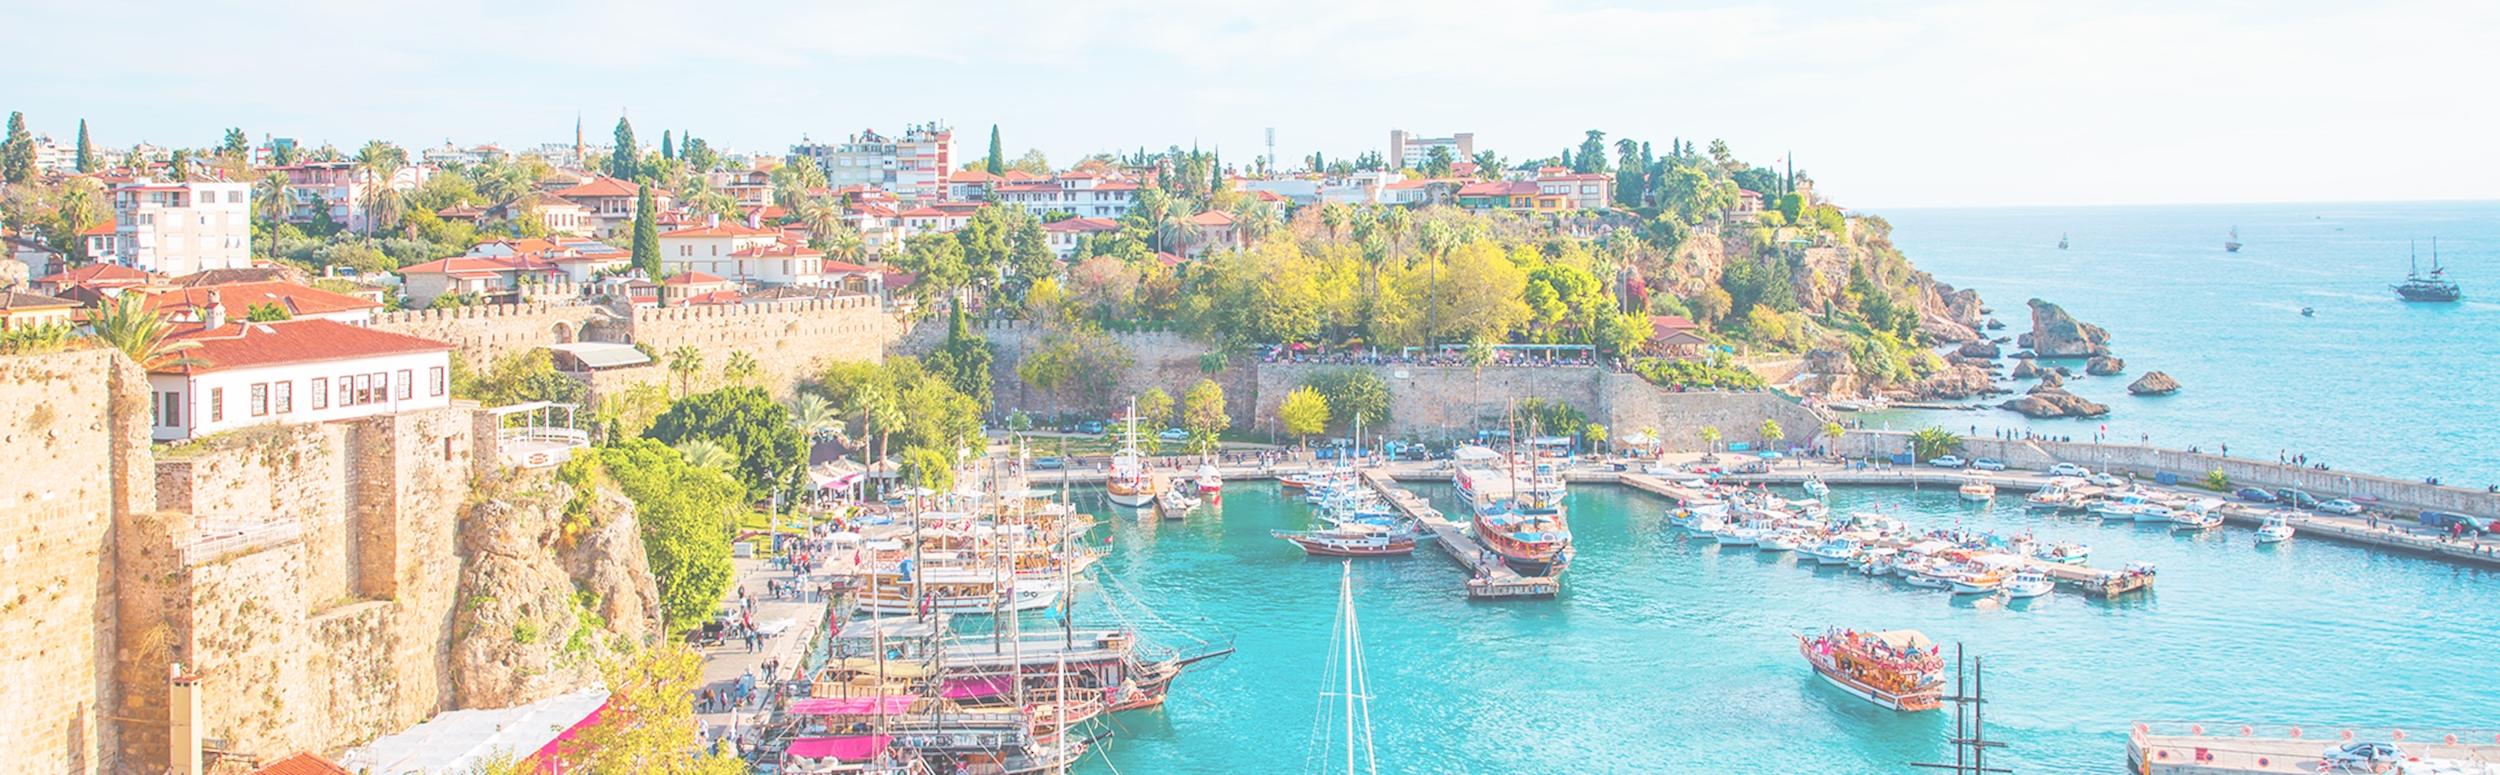 Tel Aviv - Antalya